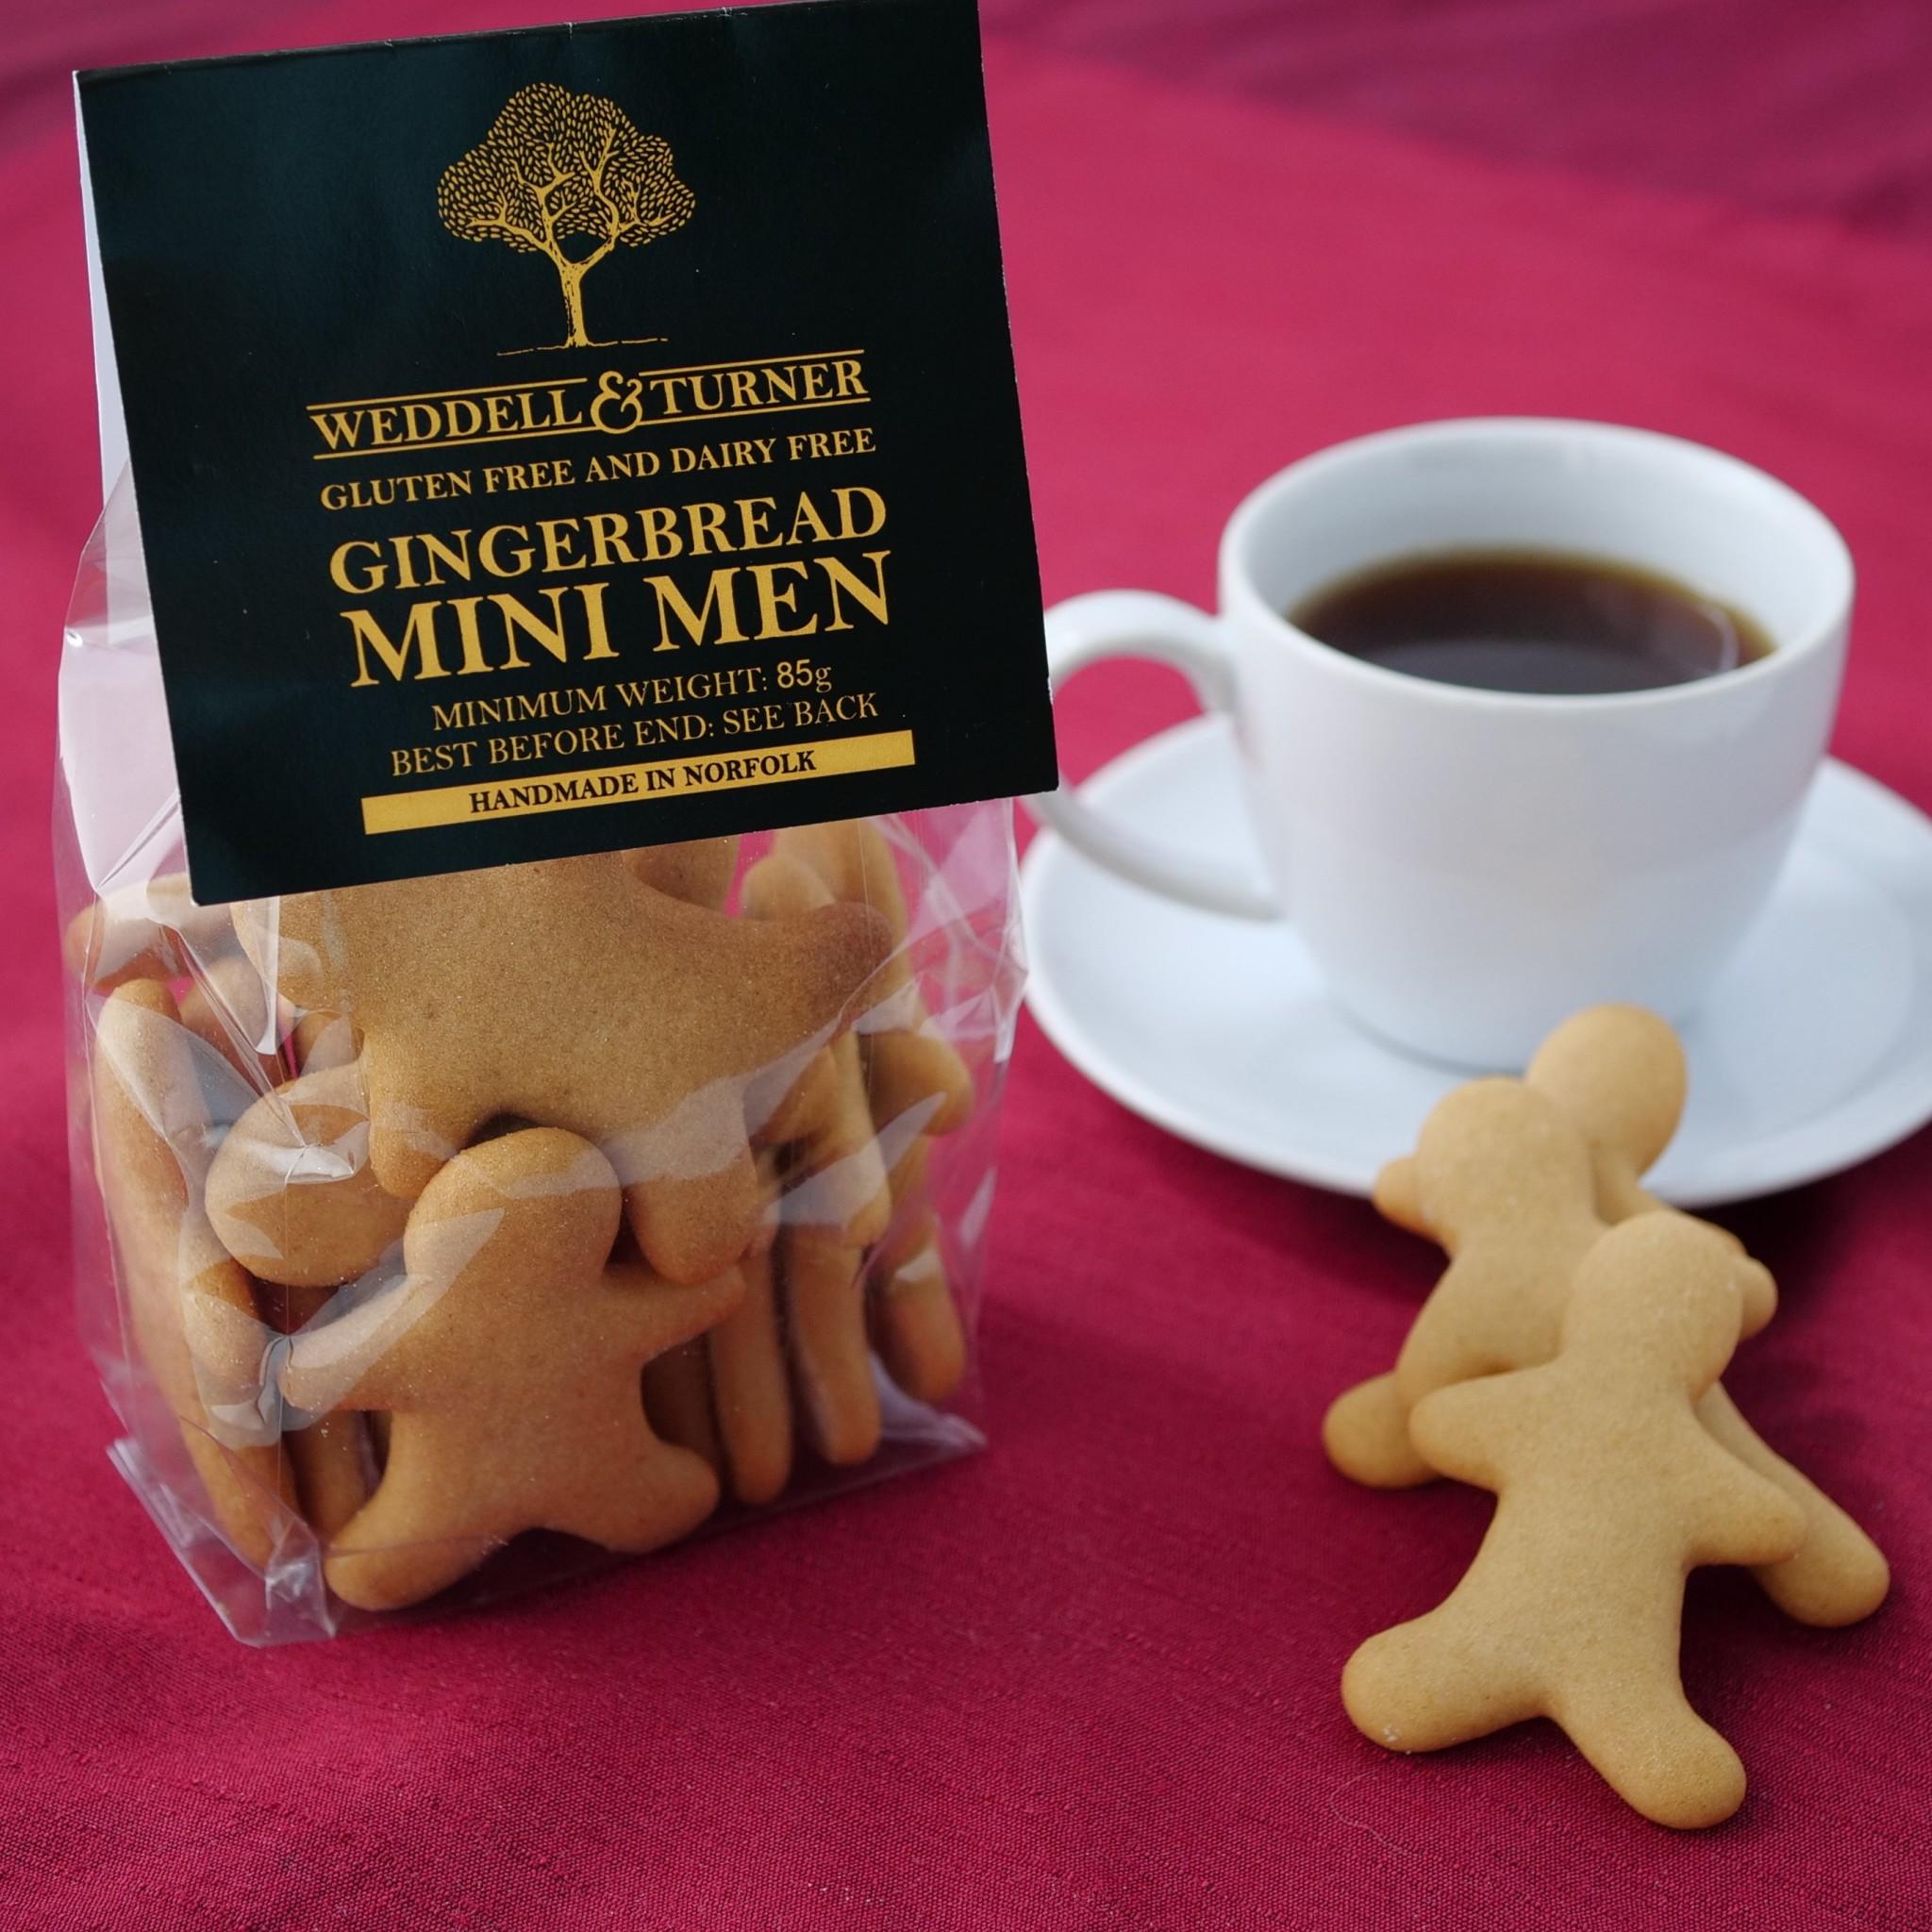 Weddell & Turner - Gingerbread Mini Men